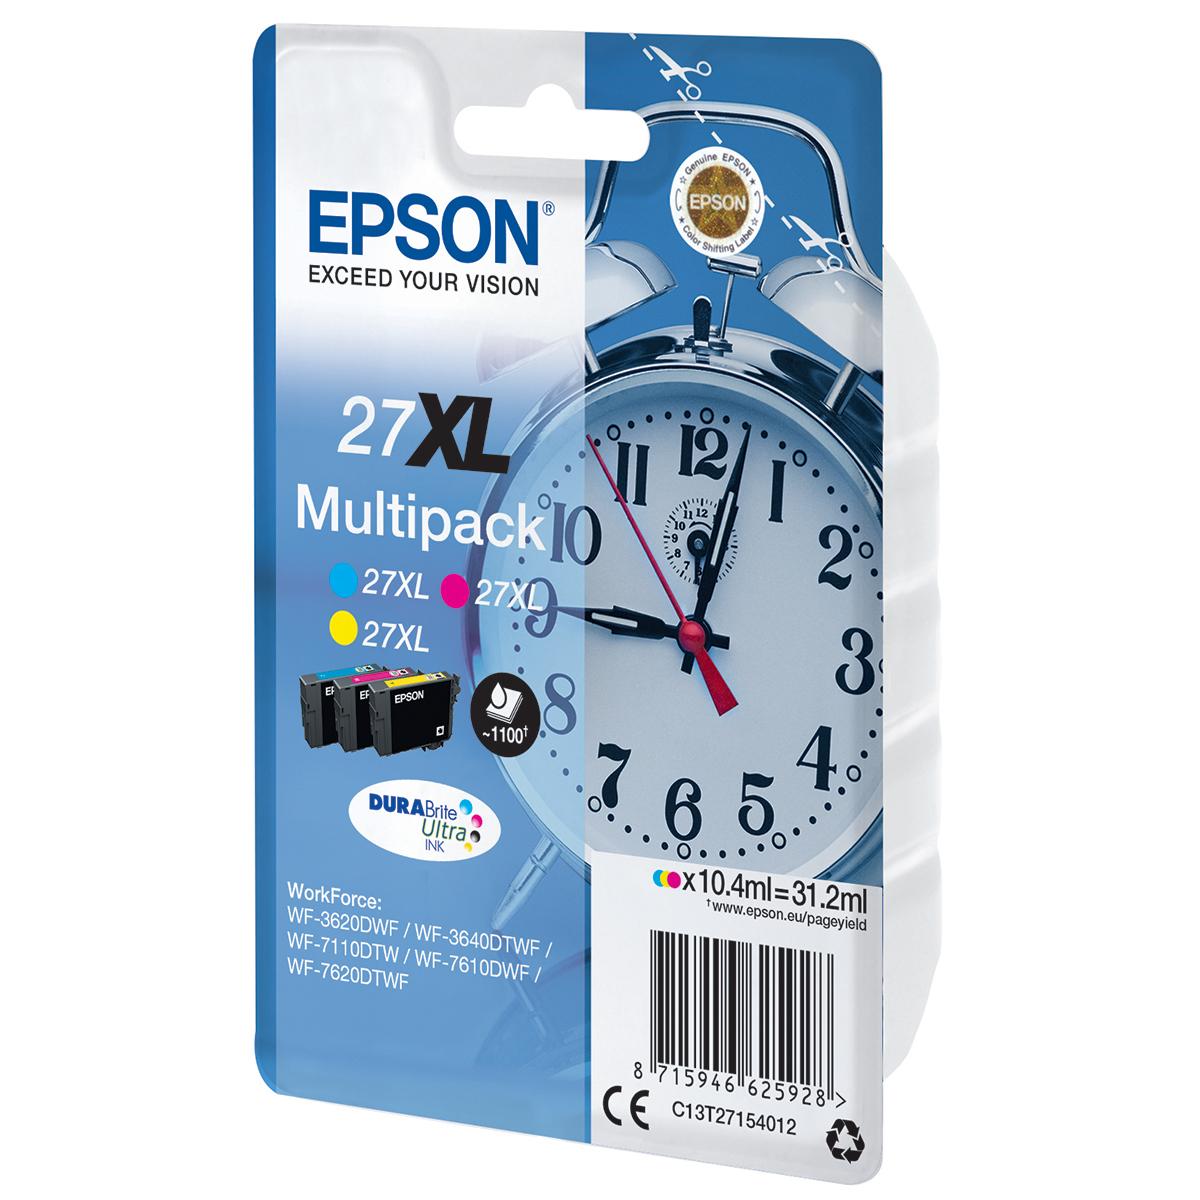 Epson 27XL Multipack 3 Ink Durabrite Ultra Cartridges